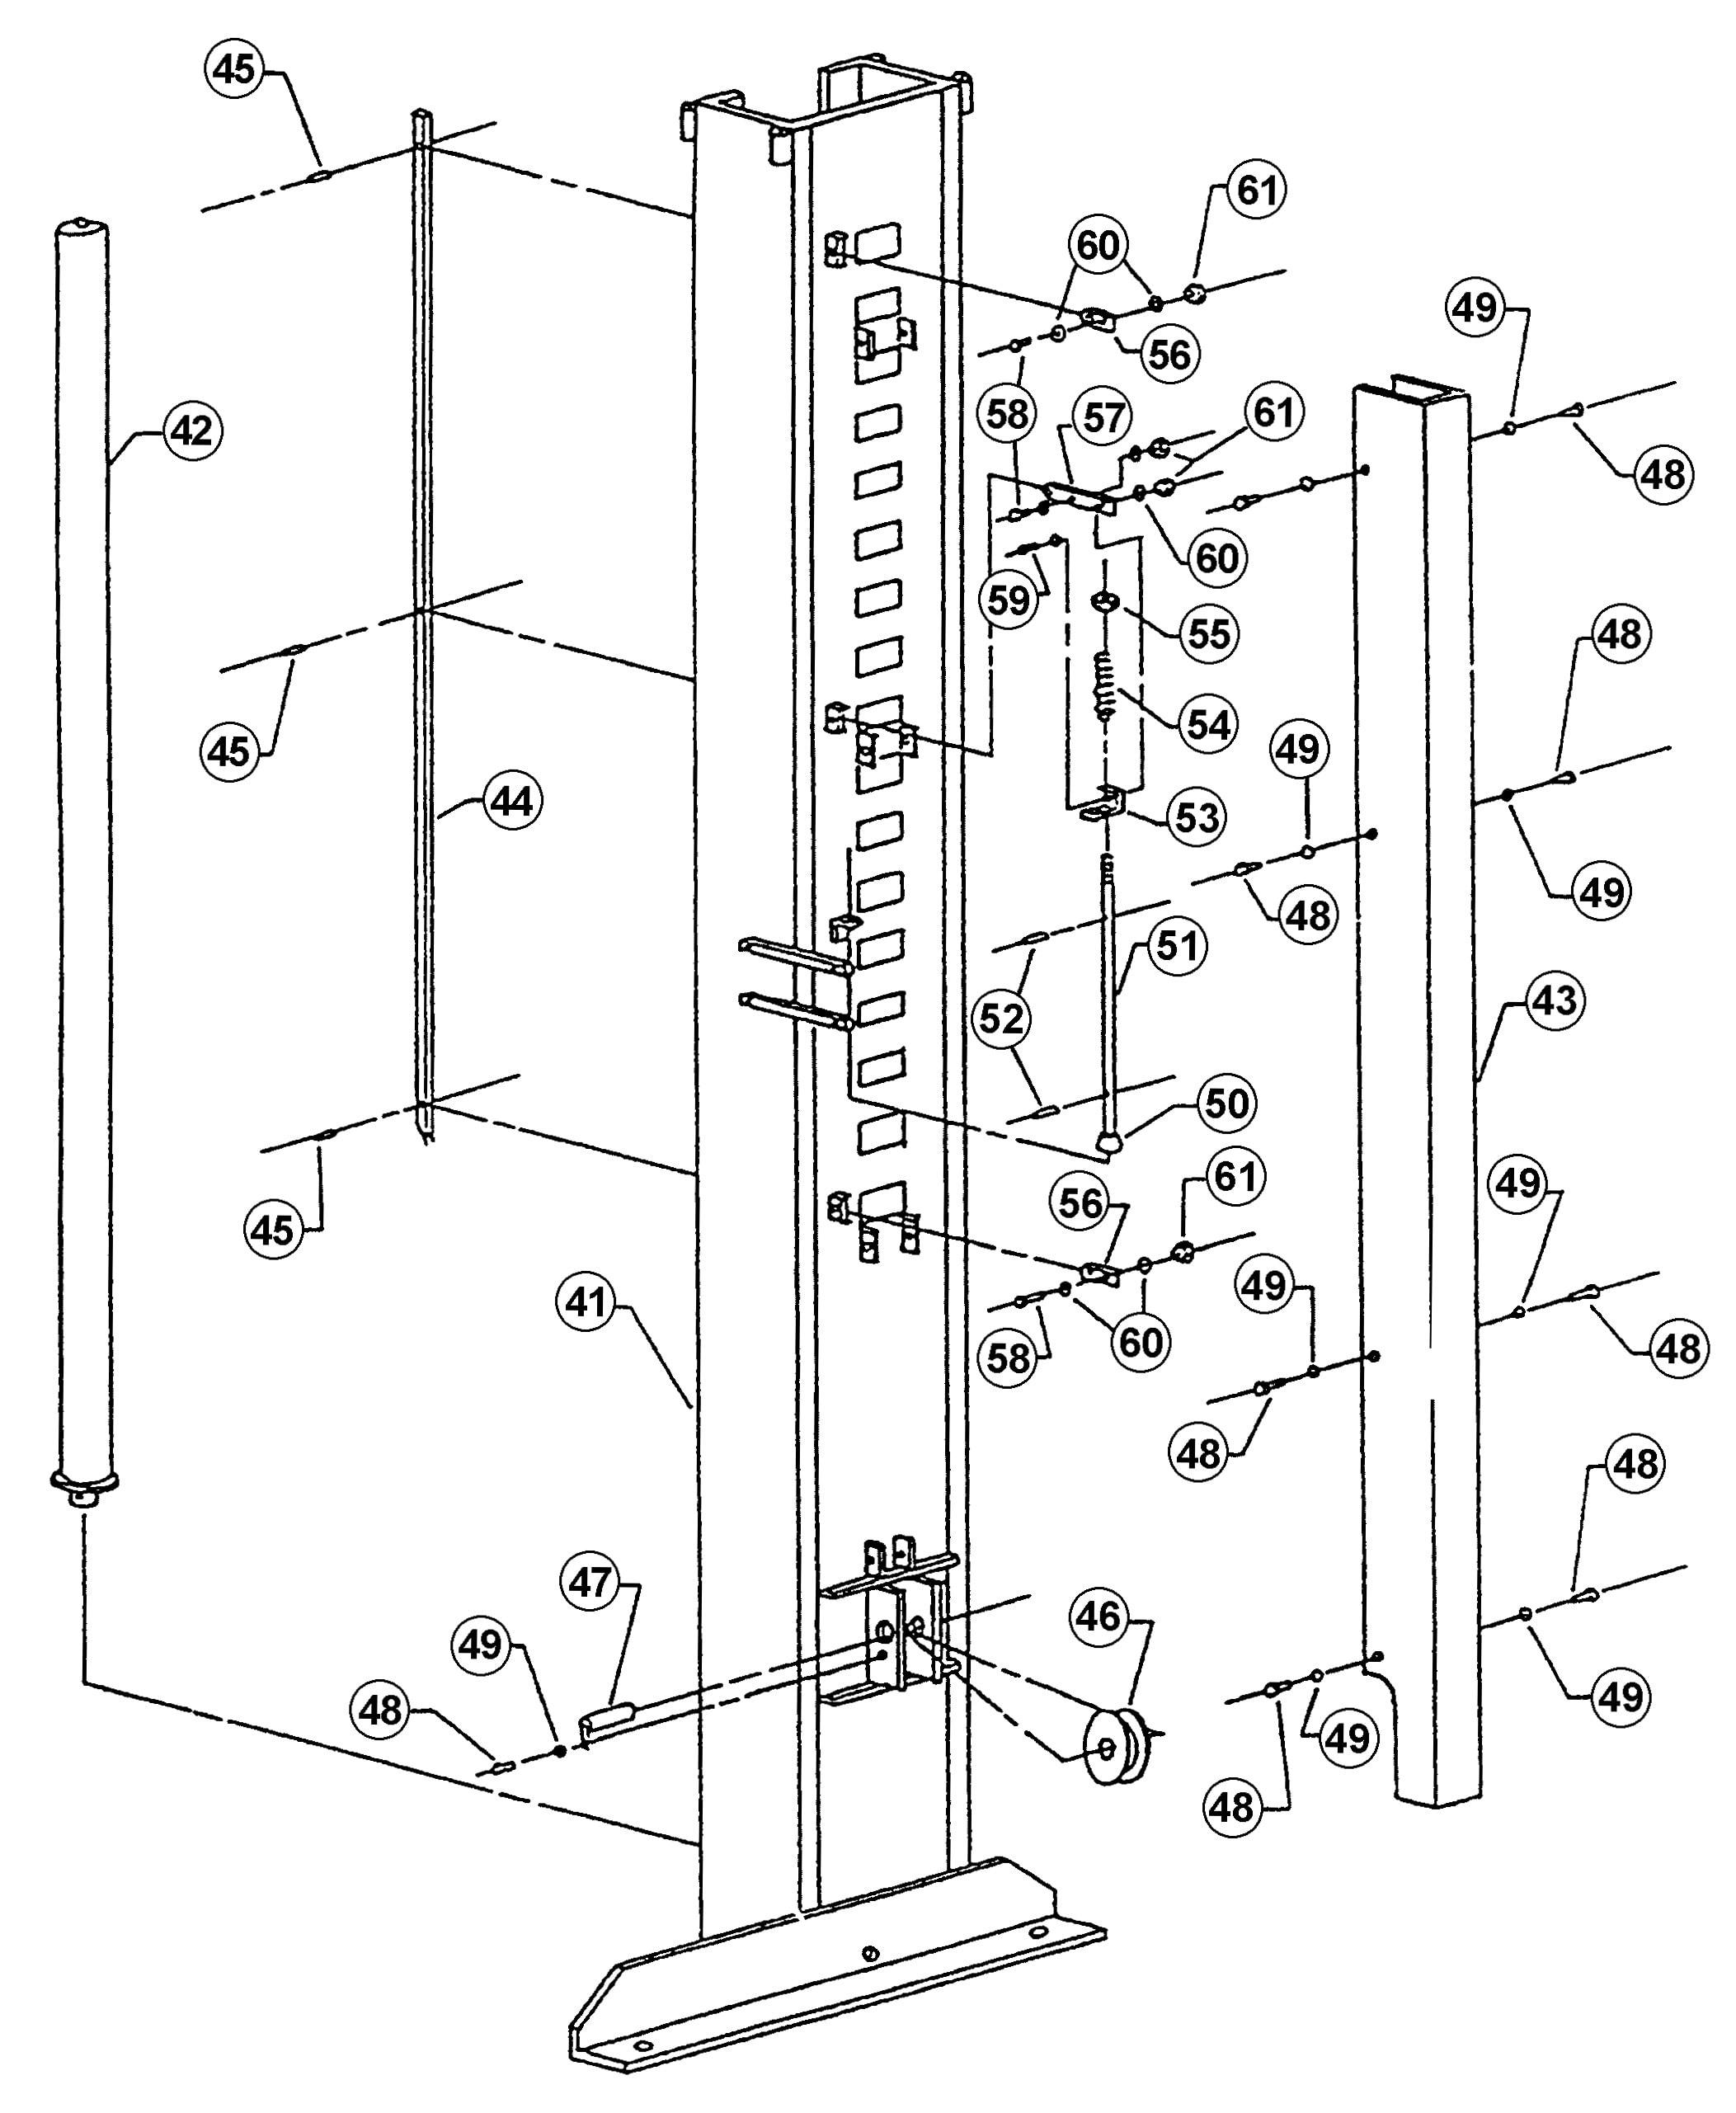 Pyle Backup Camera Wiring Diagram On Clifford Car Alarm Wiring Diagram